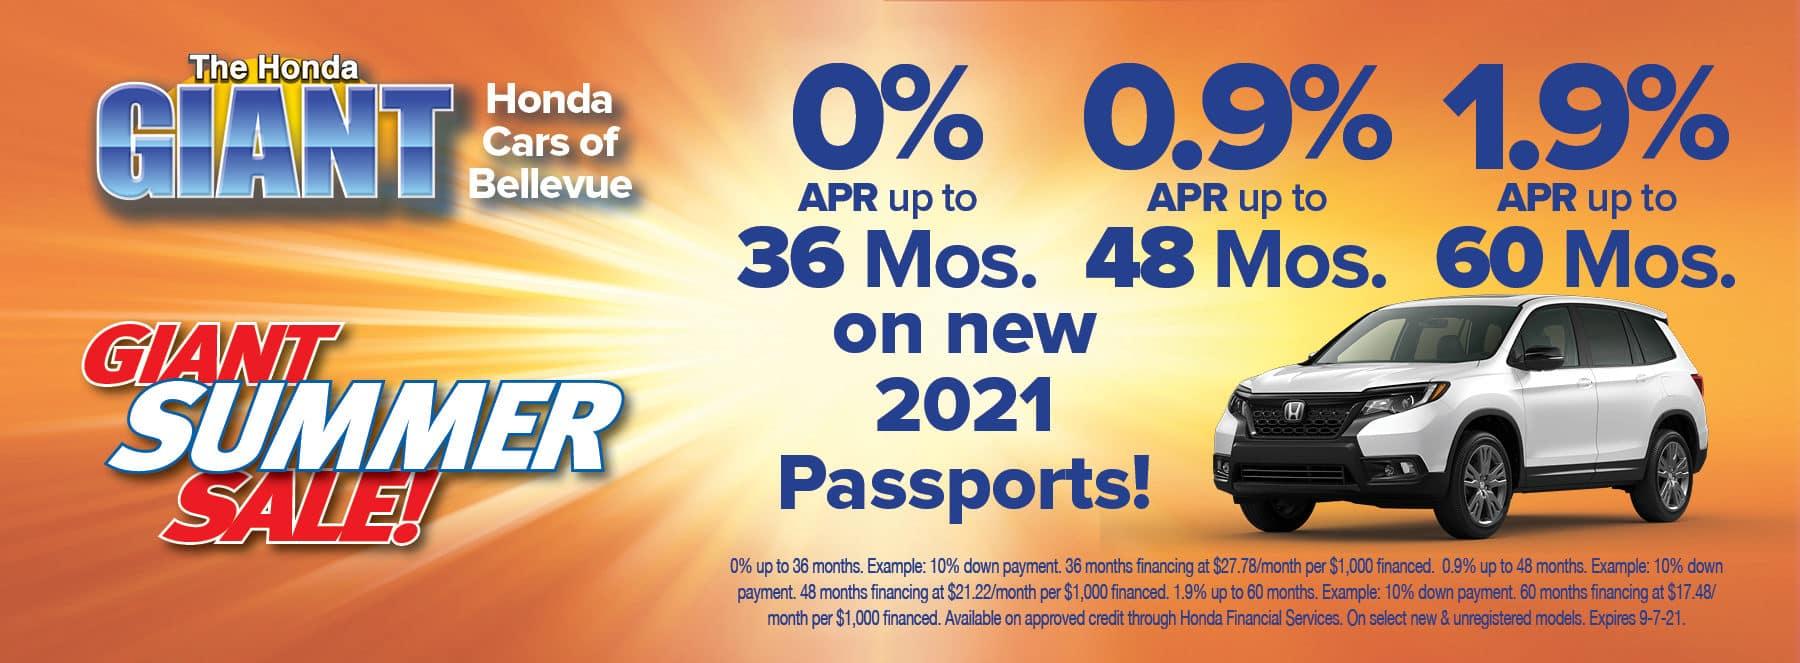 Passport July 2021